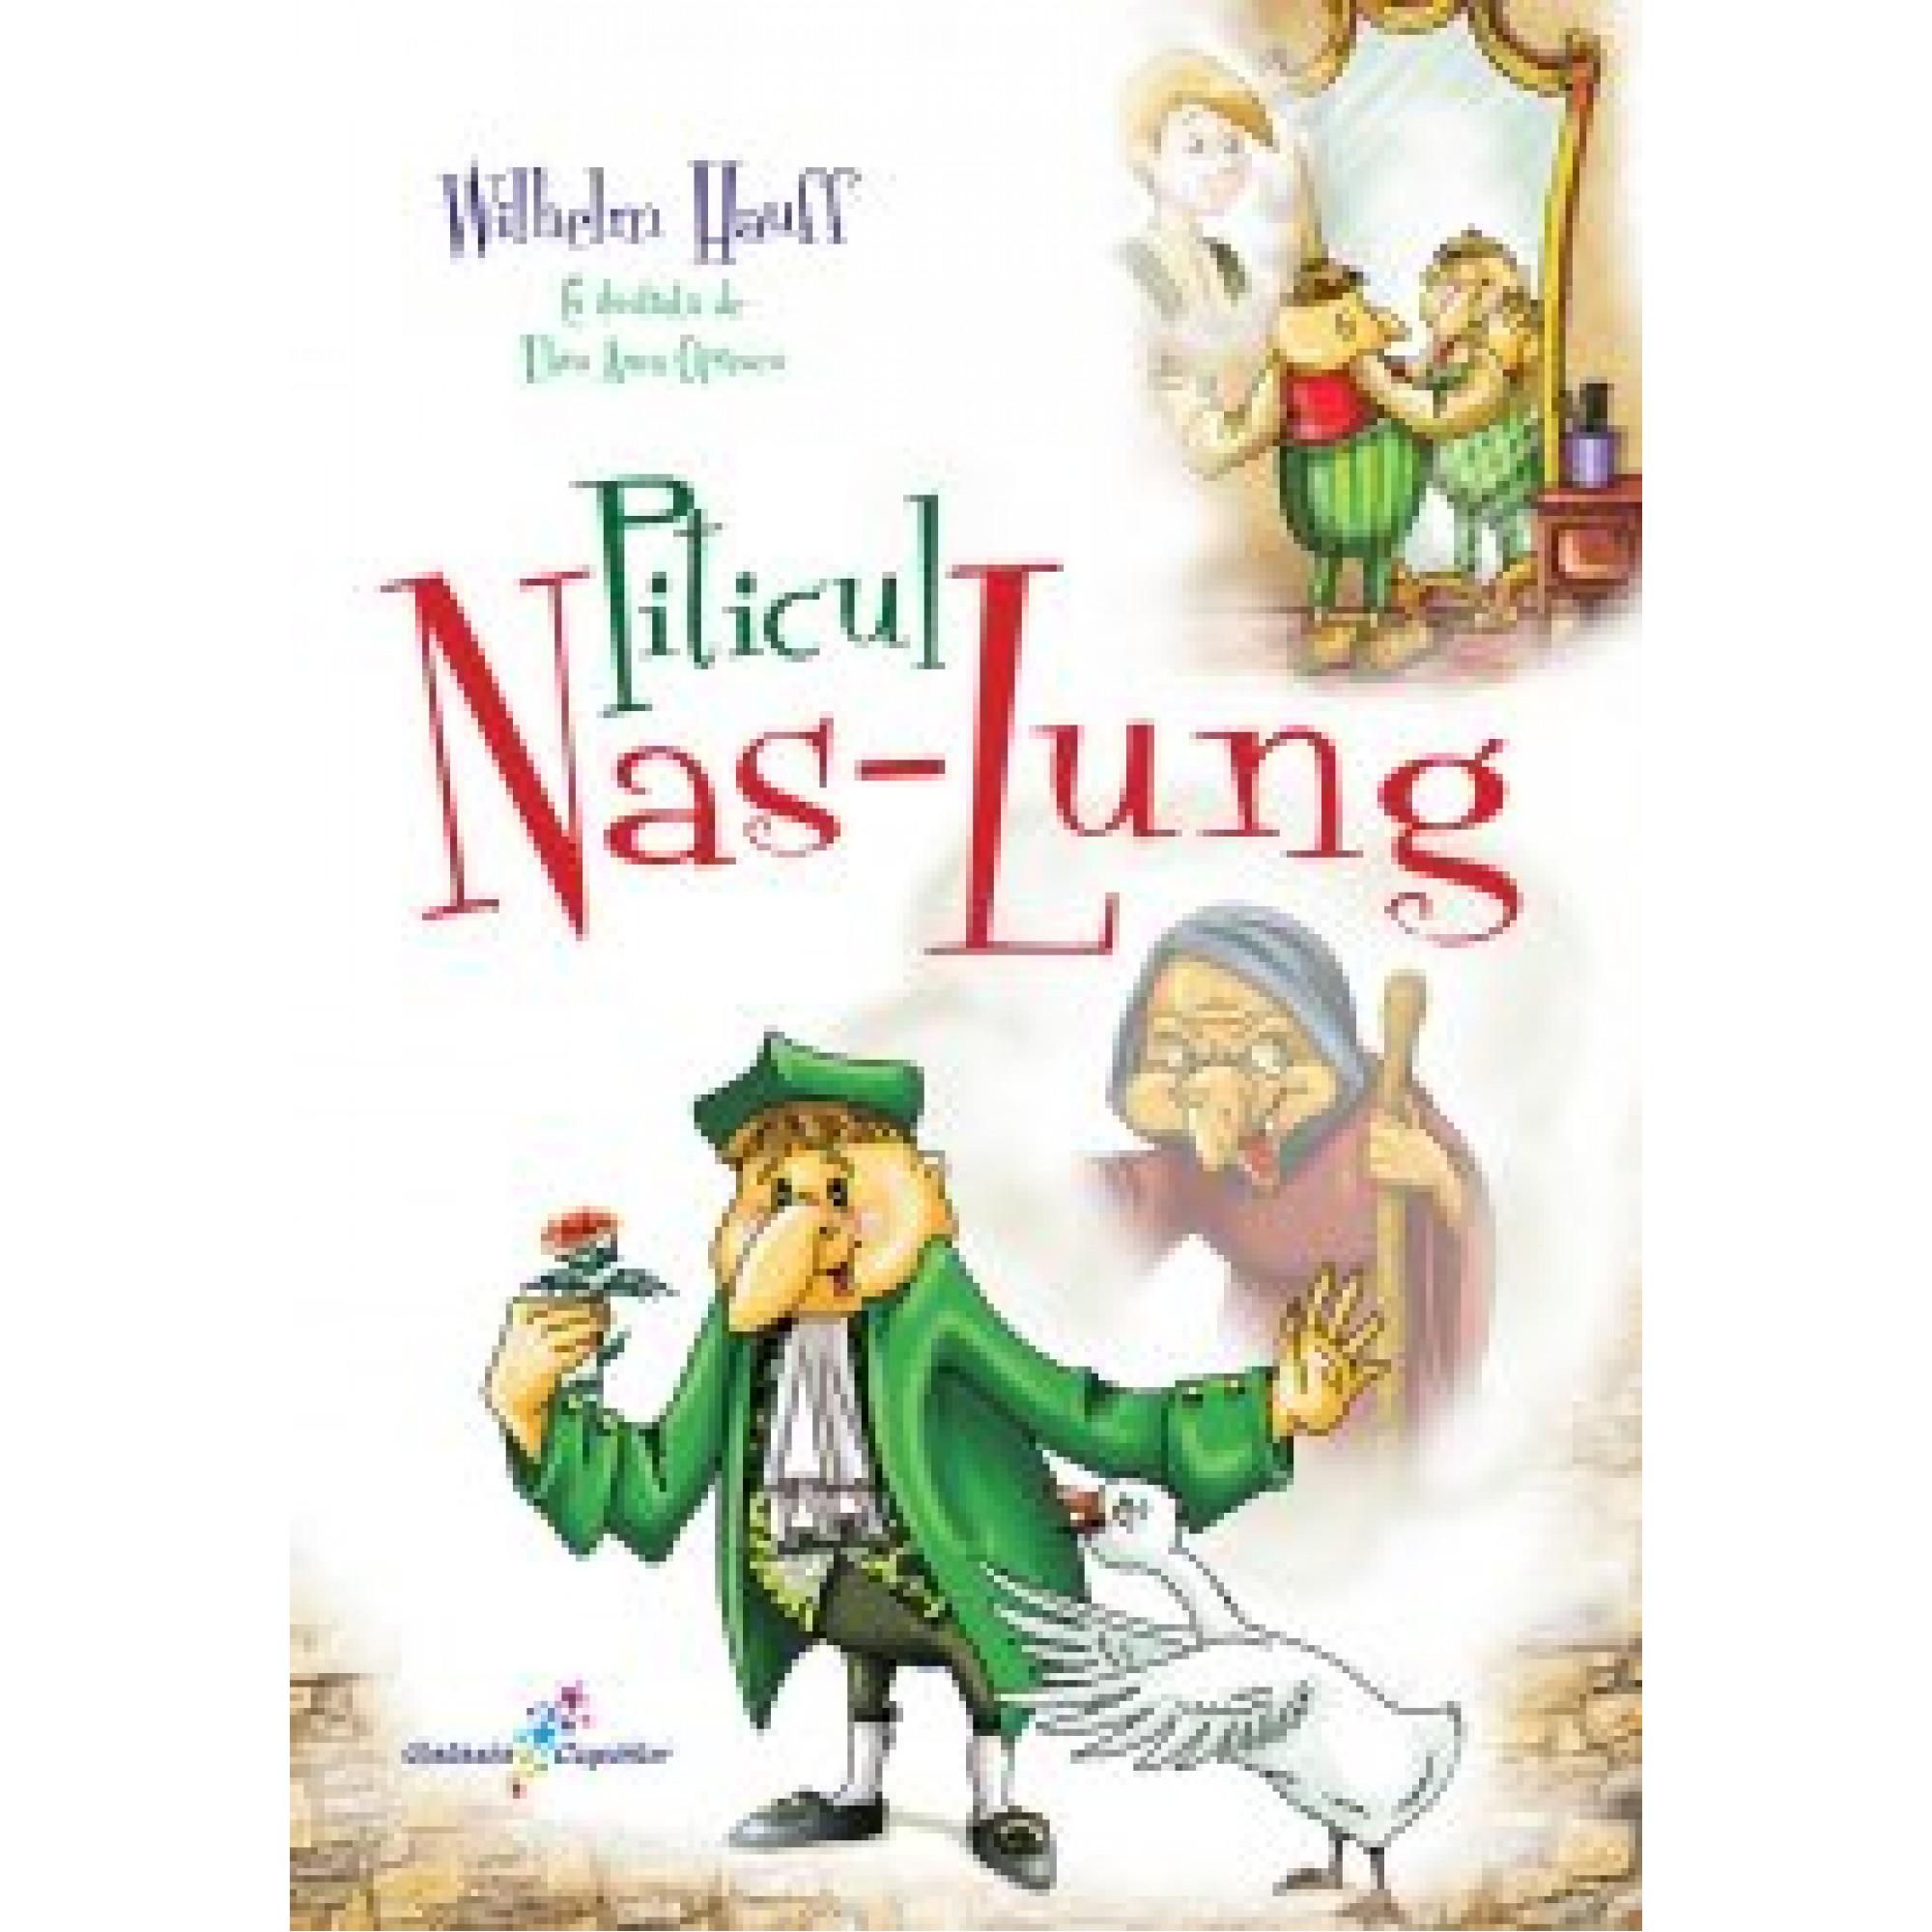 Piticul Nas Lung